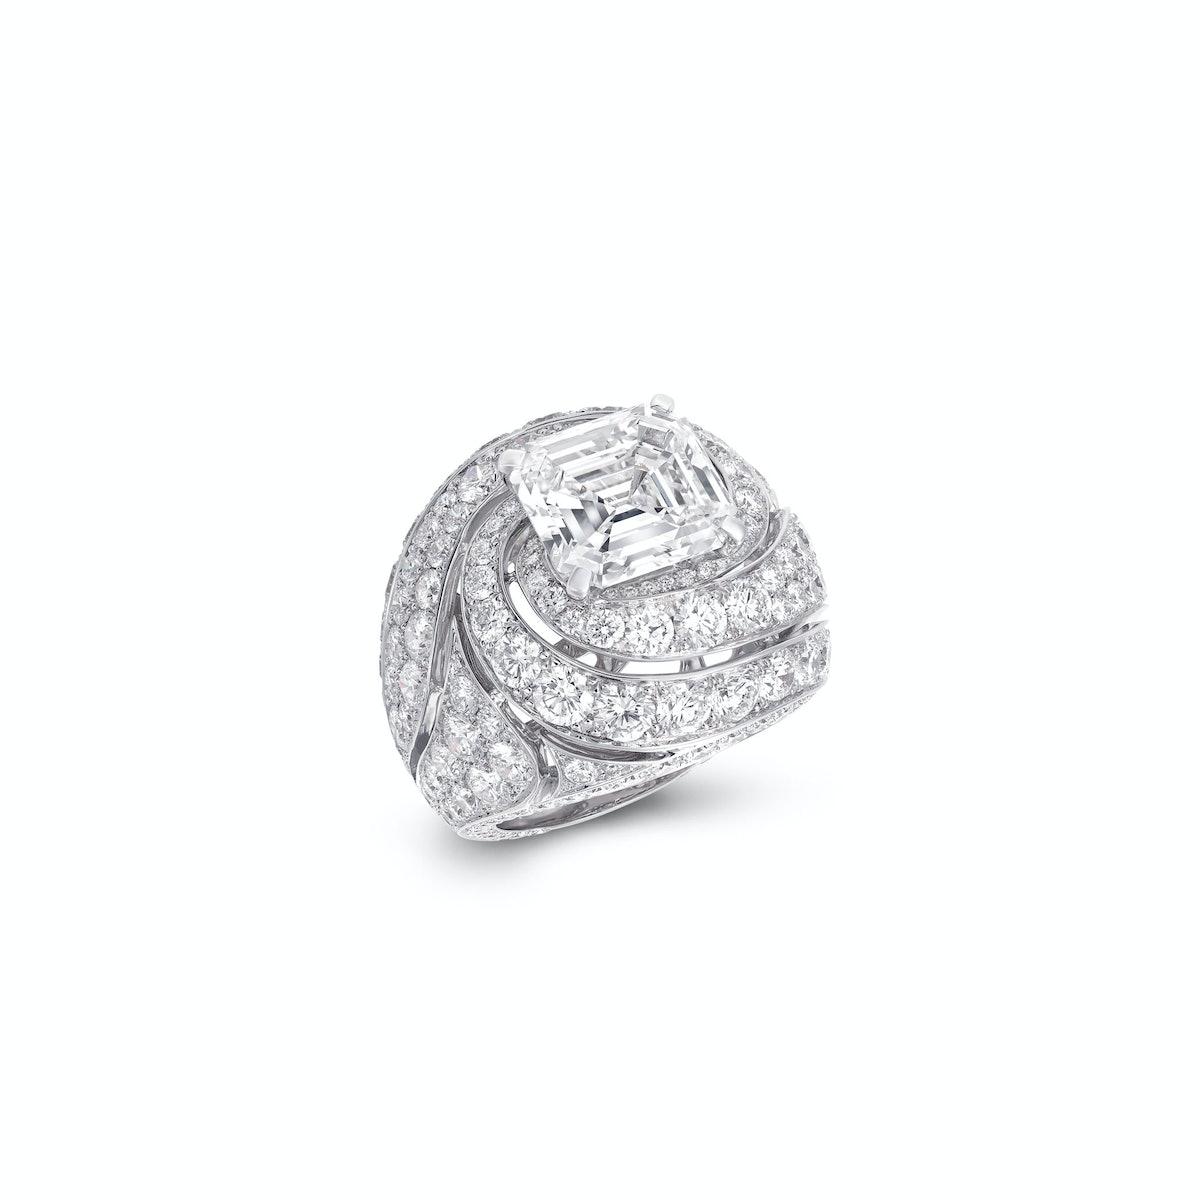 Graff-Diamond-Swirl-ring,-Price-Upon-Request,-at-Graff-New-York,-212-355-9292;-www.graffdiamonds.com